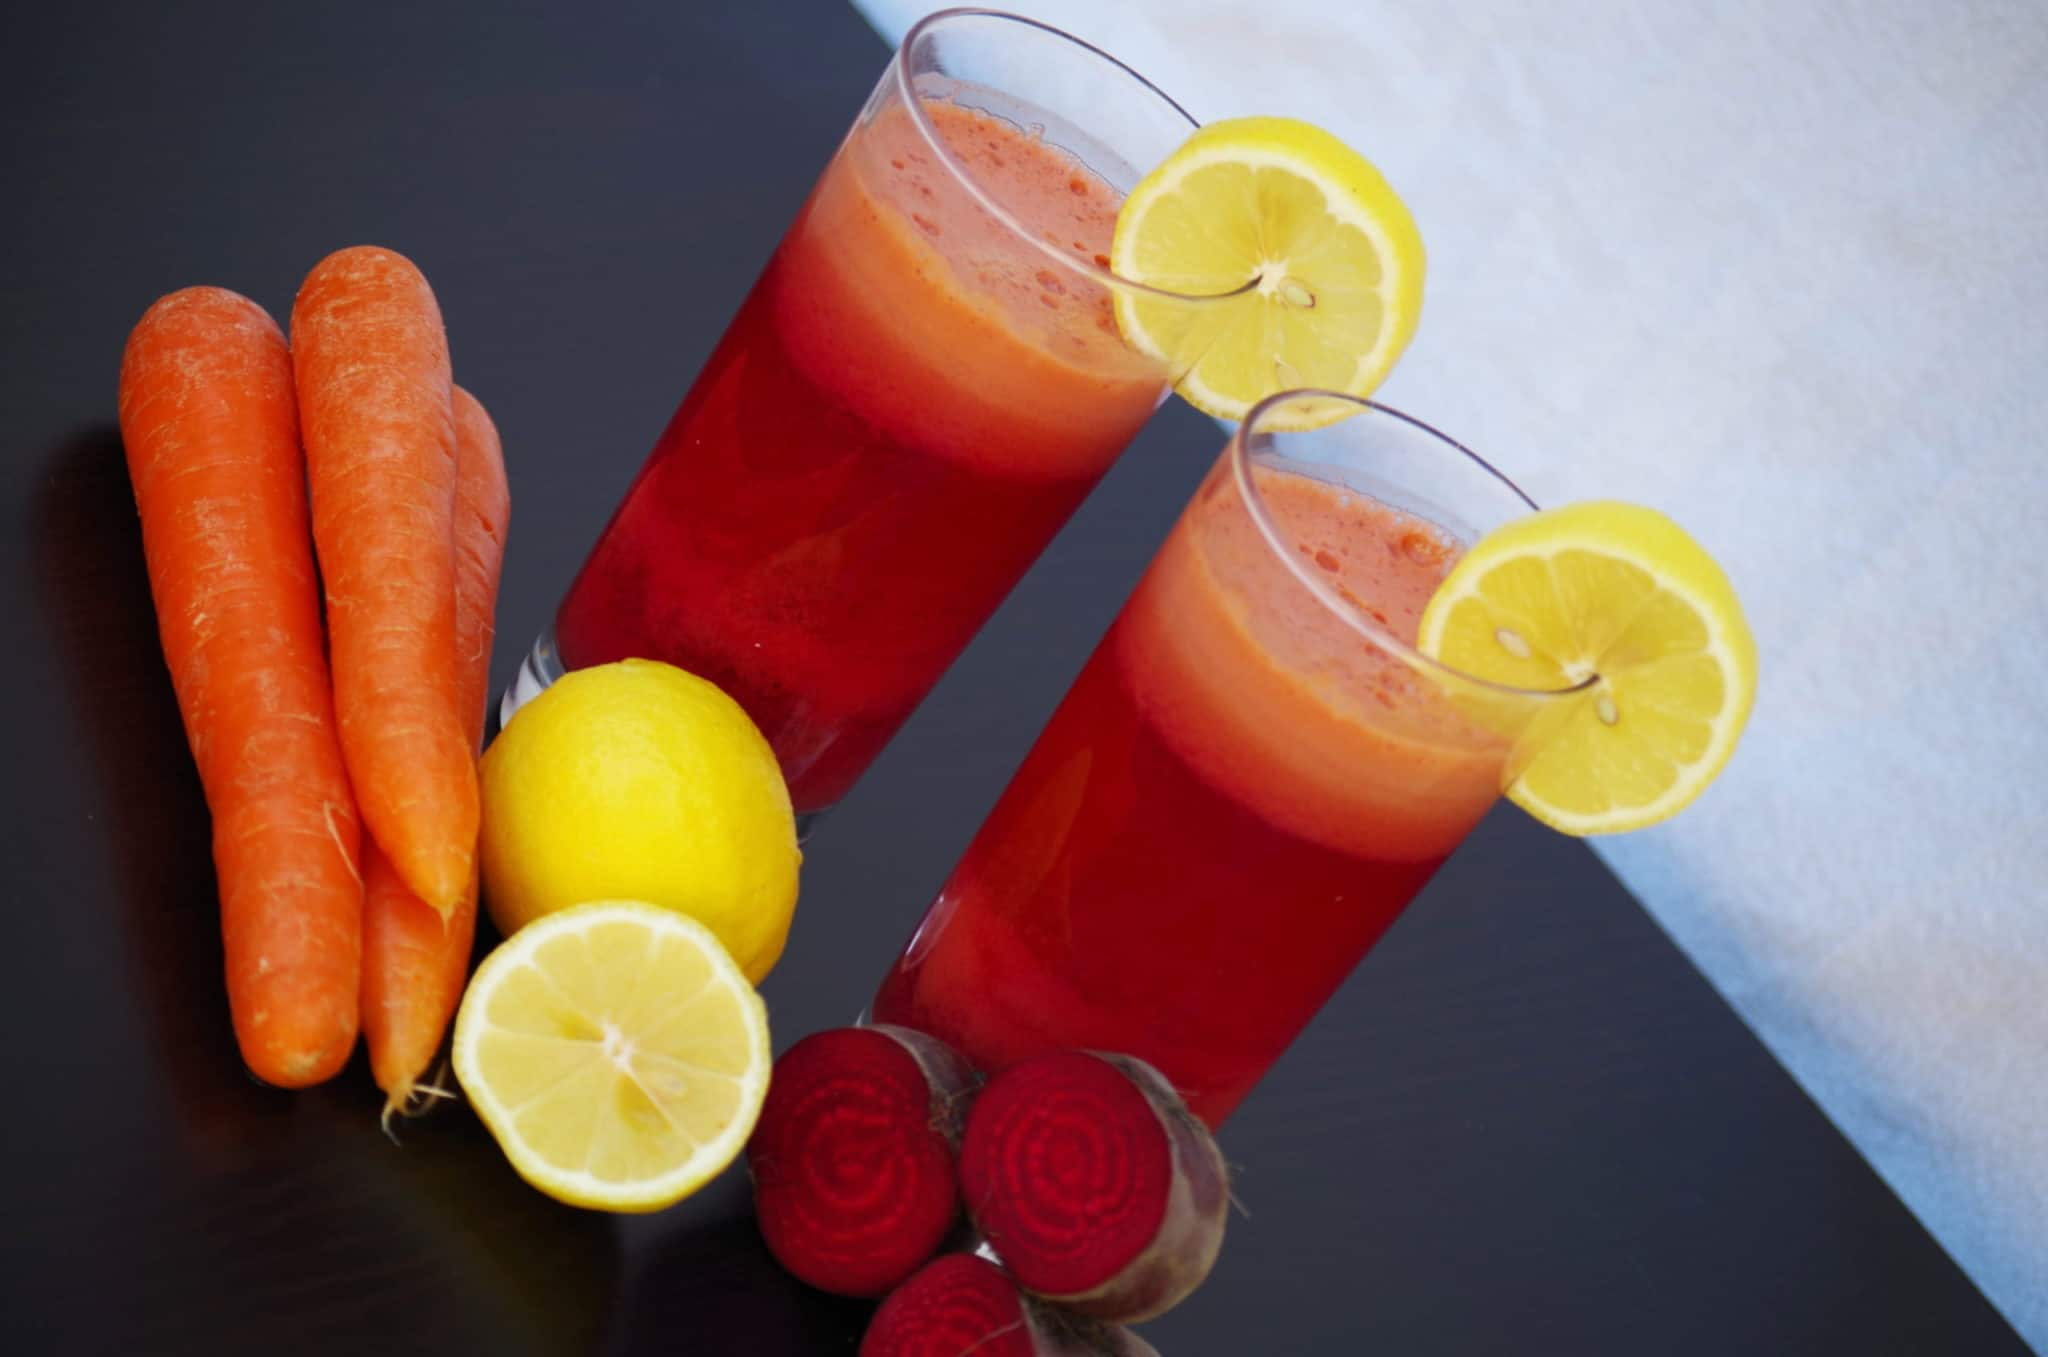 Beet Apple Carrot Lemon Ginger Juice Benefits